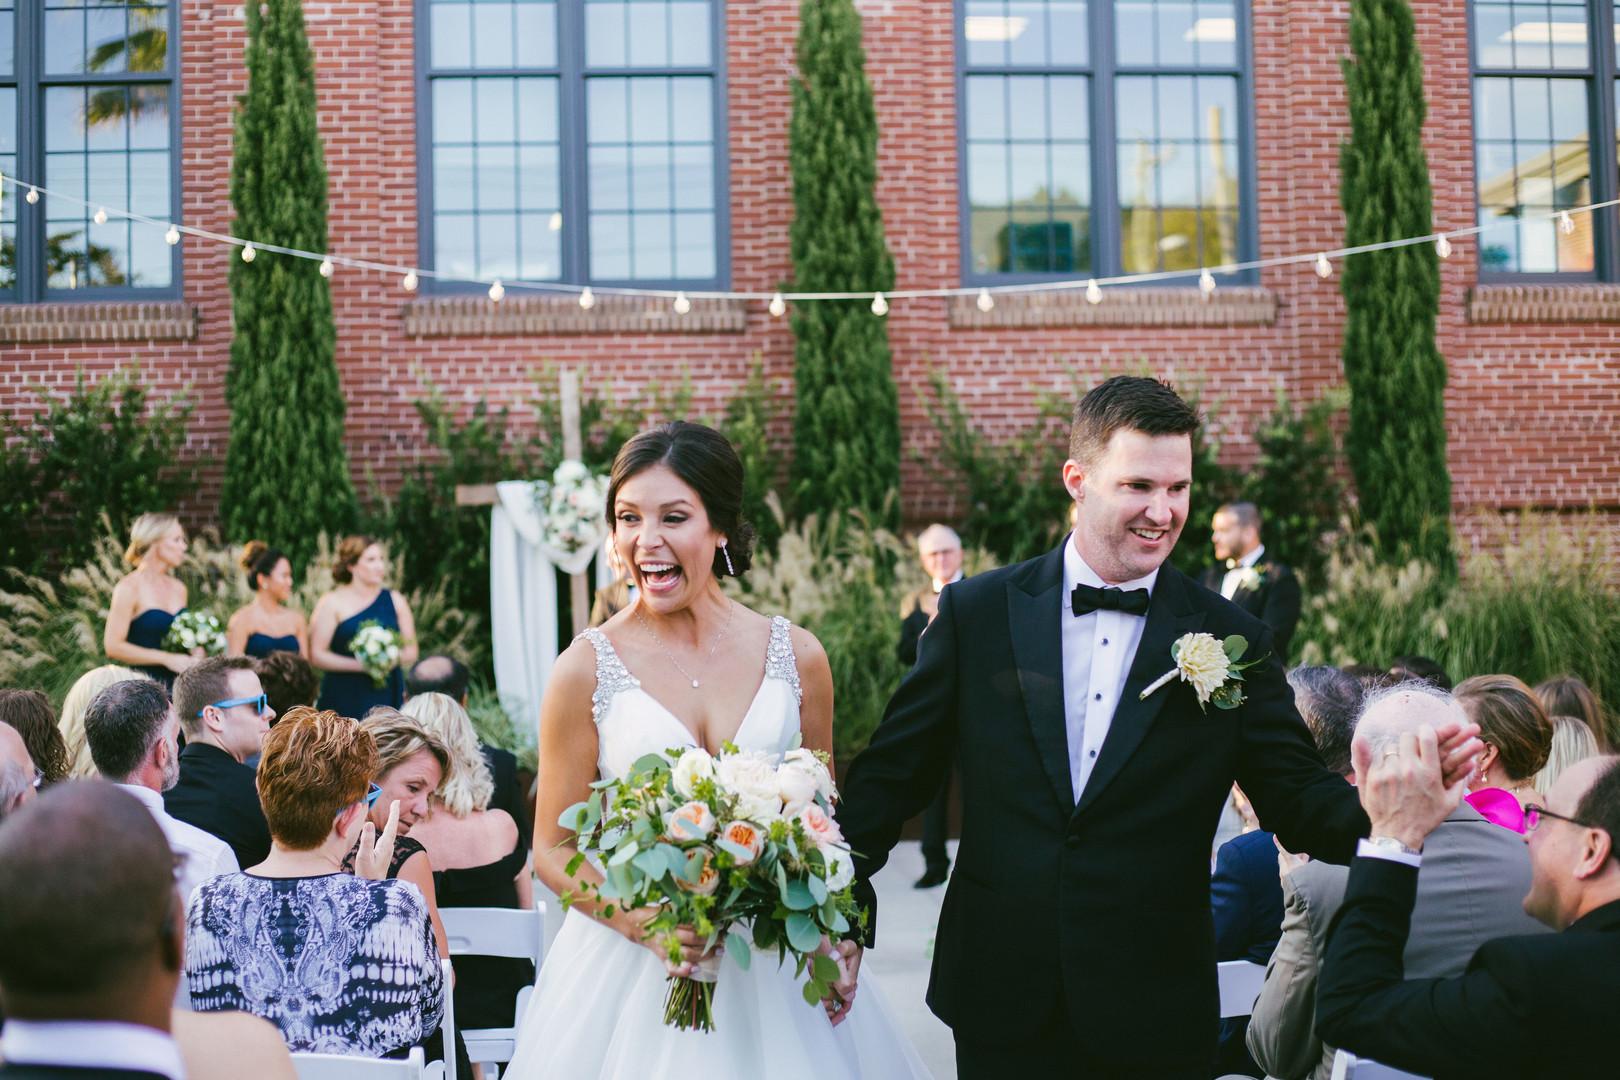 cedar-room-wedding-17.jpg